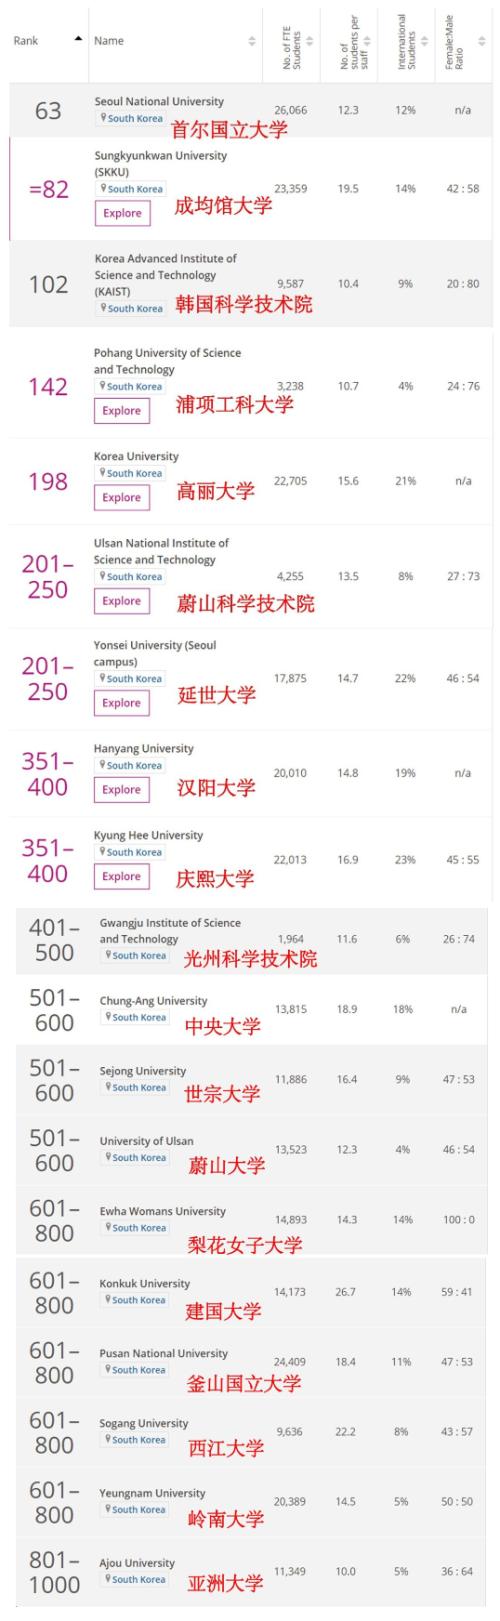 韩国总排名.png